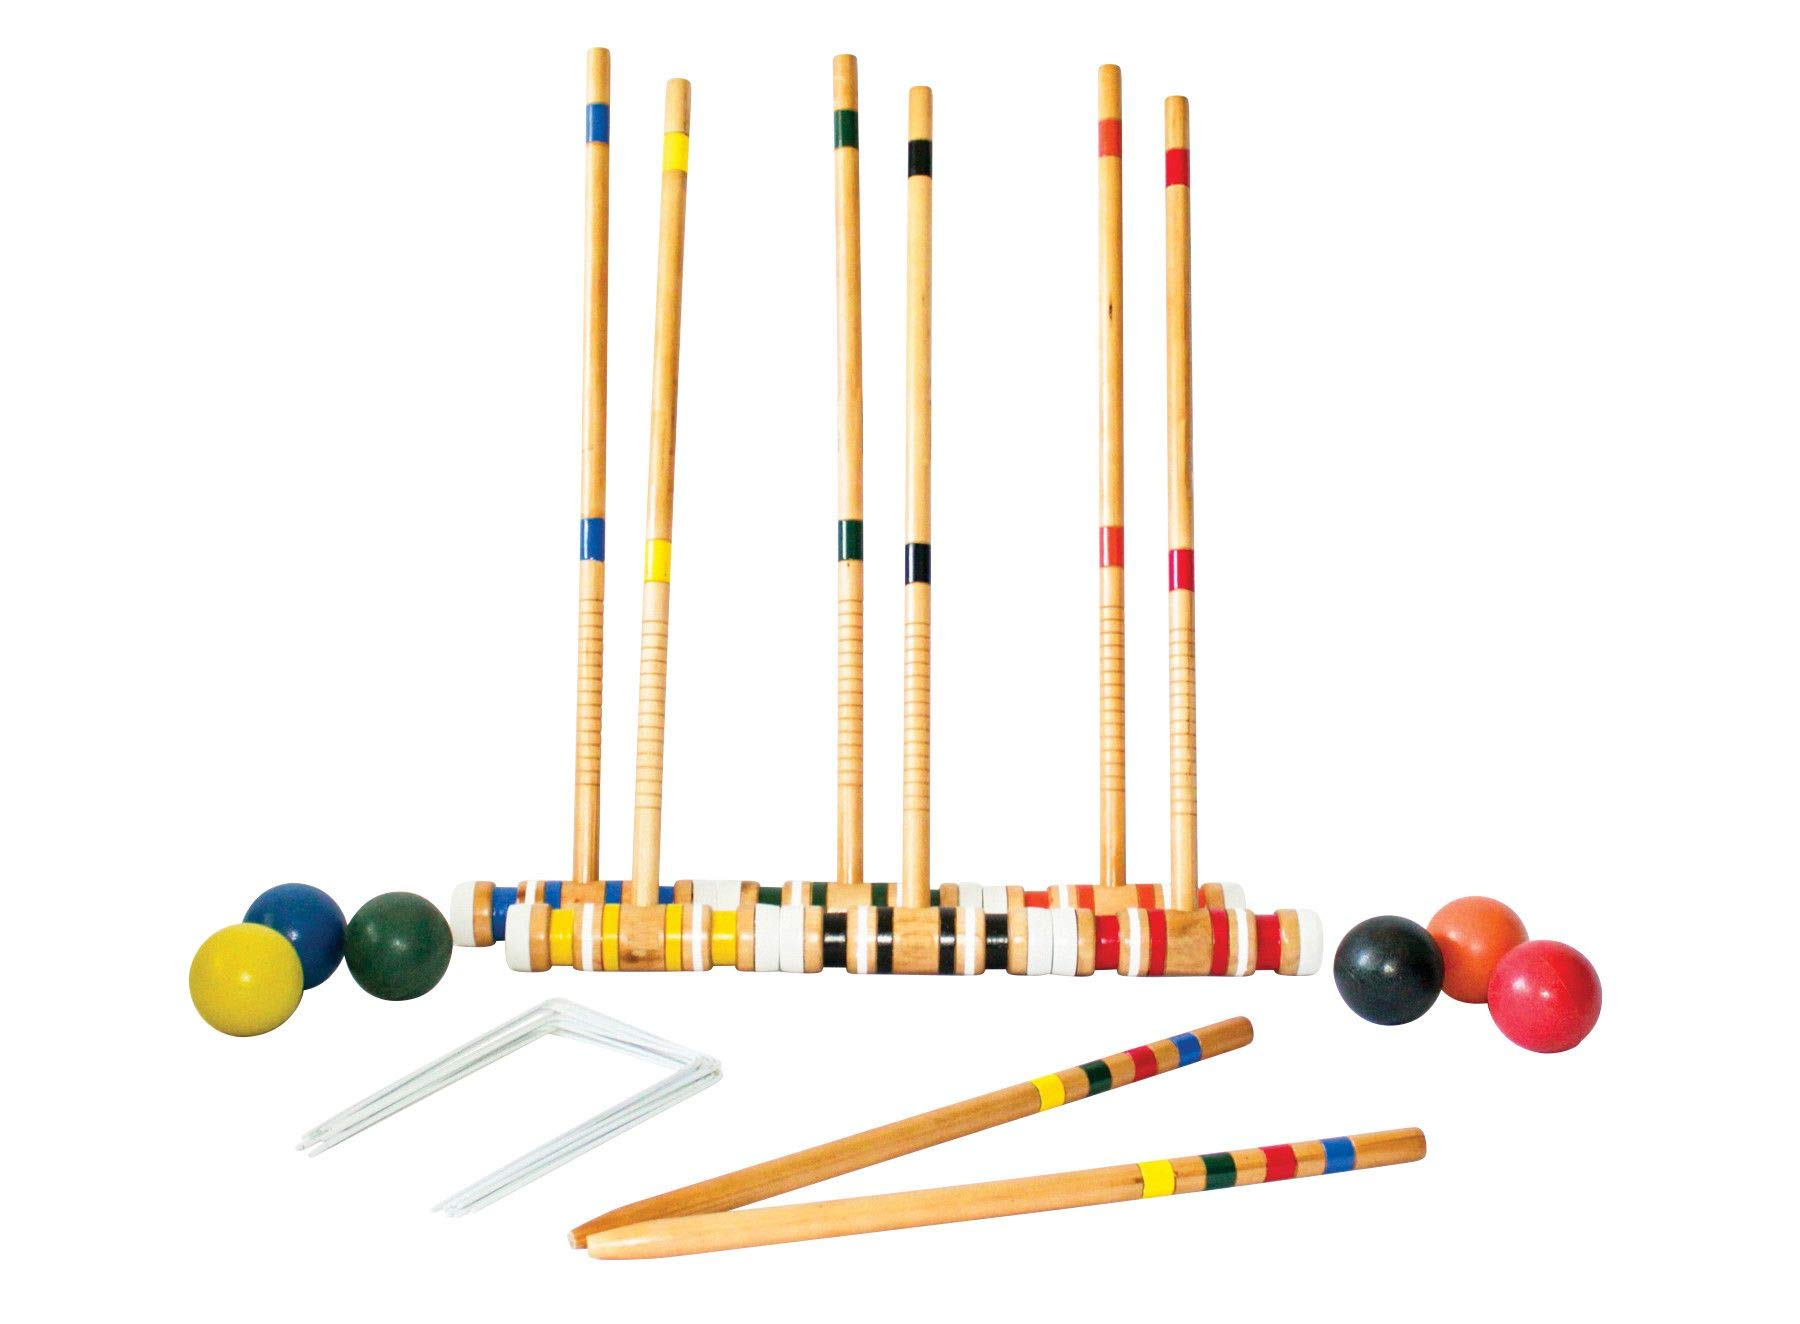 HealthyBells 6-Player Beginner Backyard Croquet Set Includes 6 Wood Mallets, 6 Balls, and Carry Bag